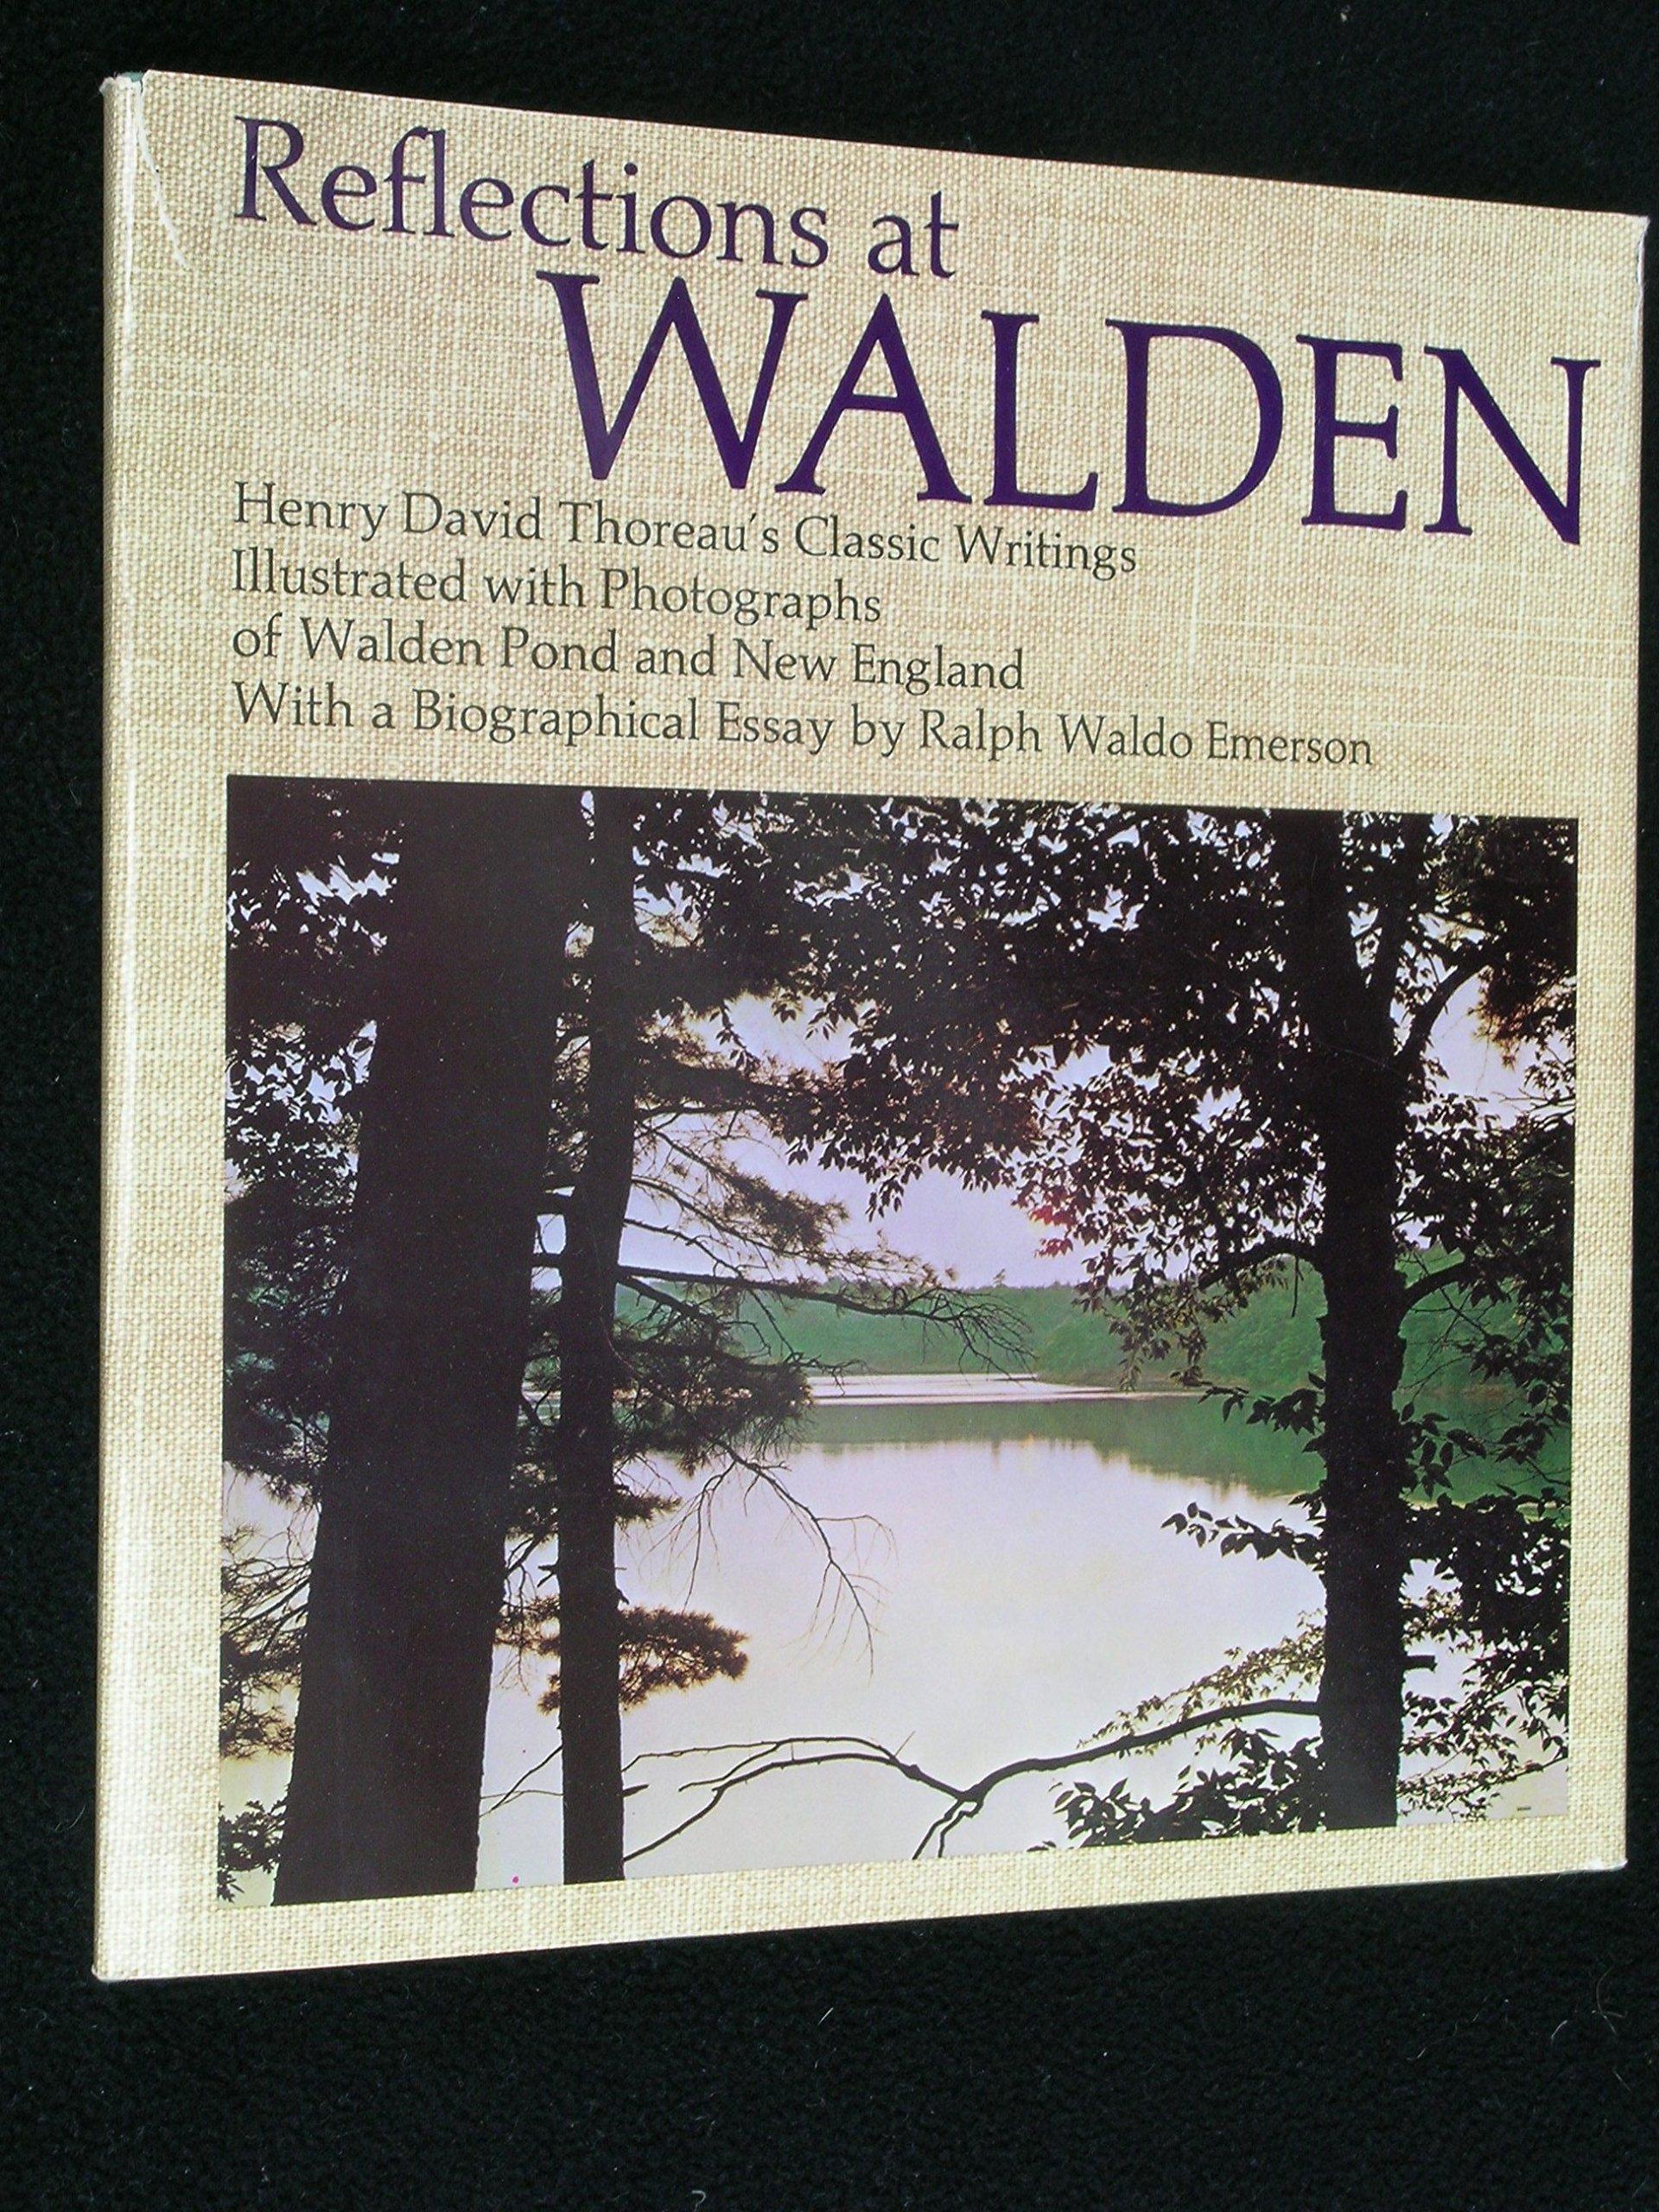 Nature thoreau essay walden Henry David Thoreau s Cabin at Walden Pond